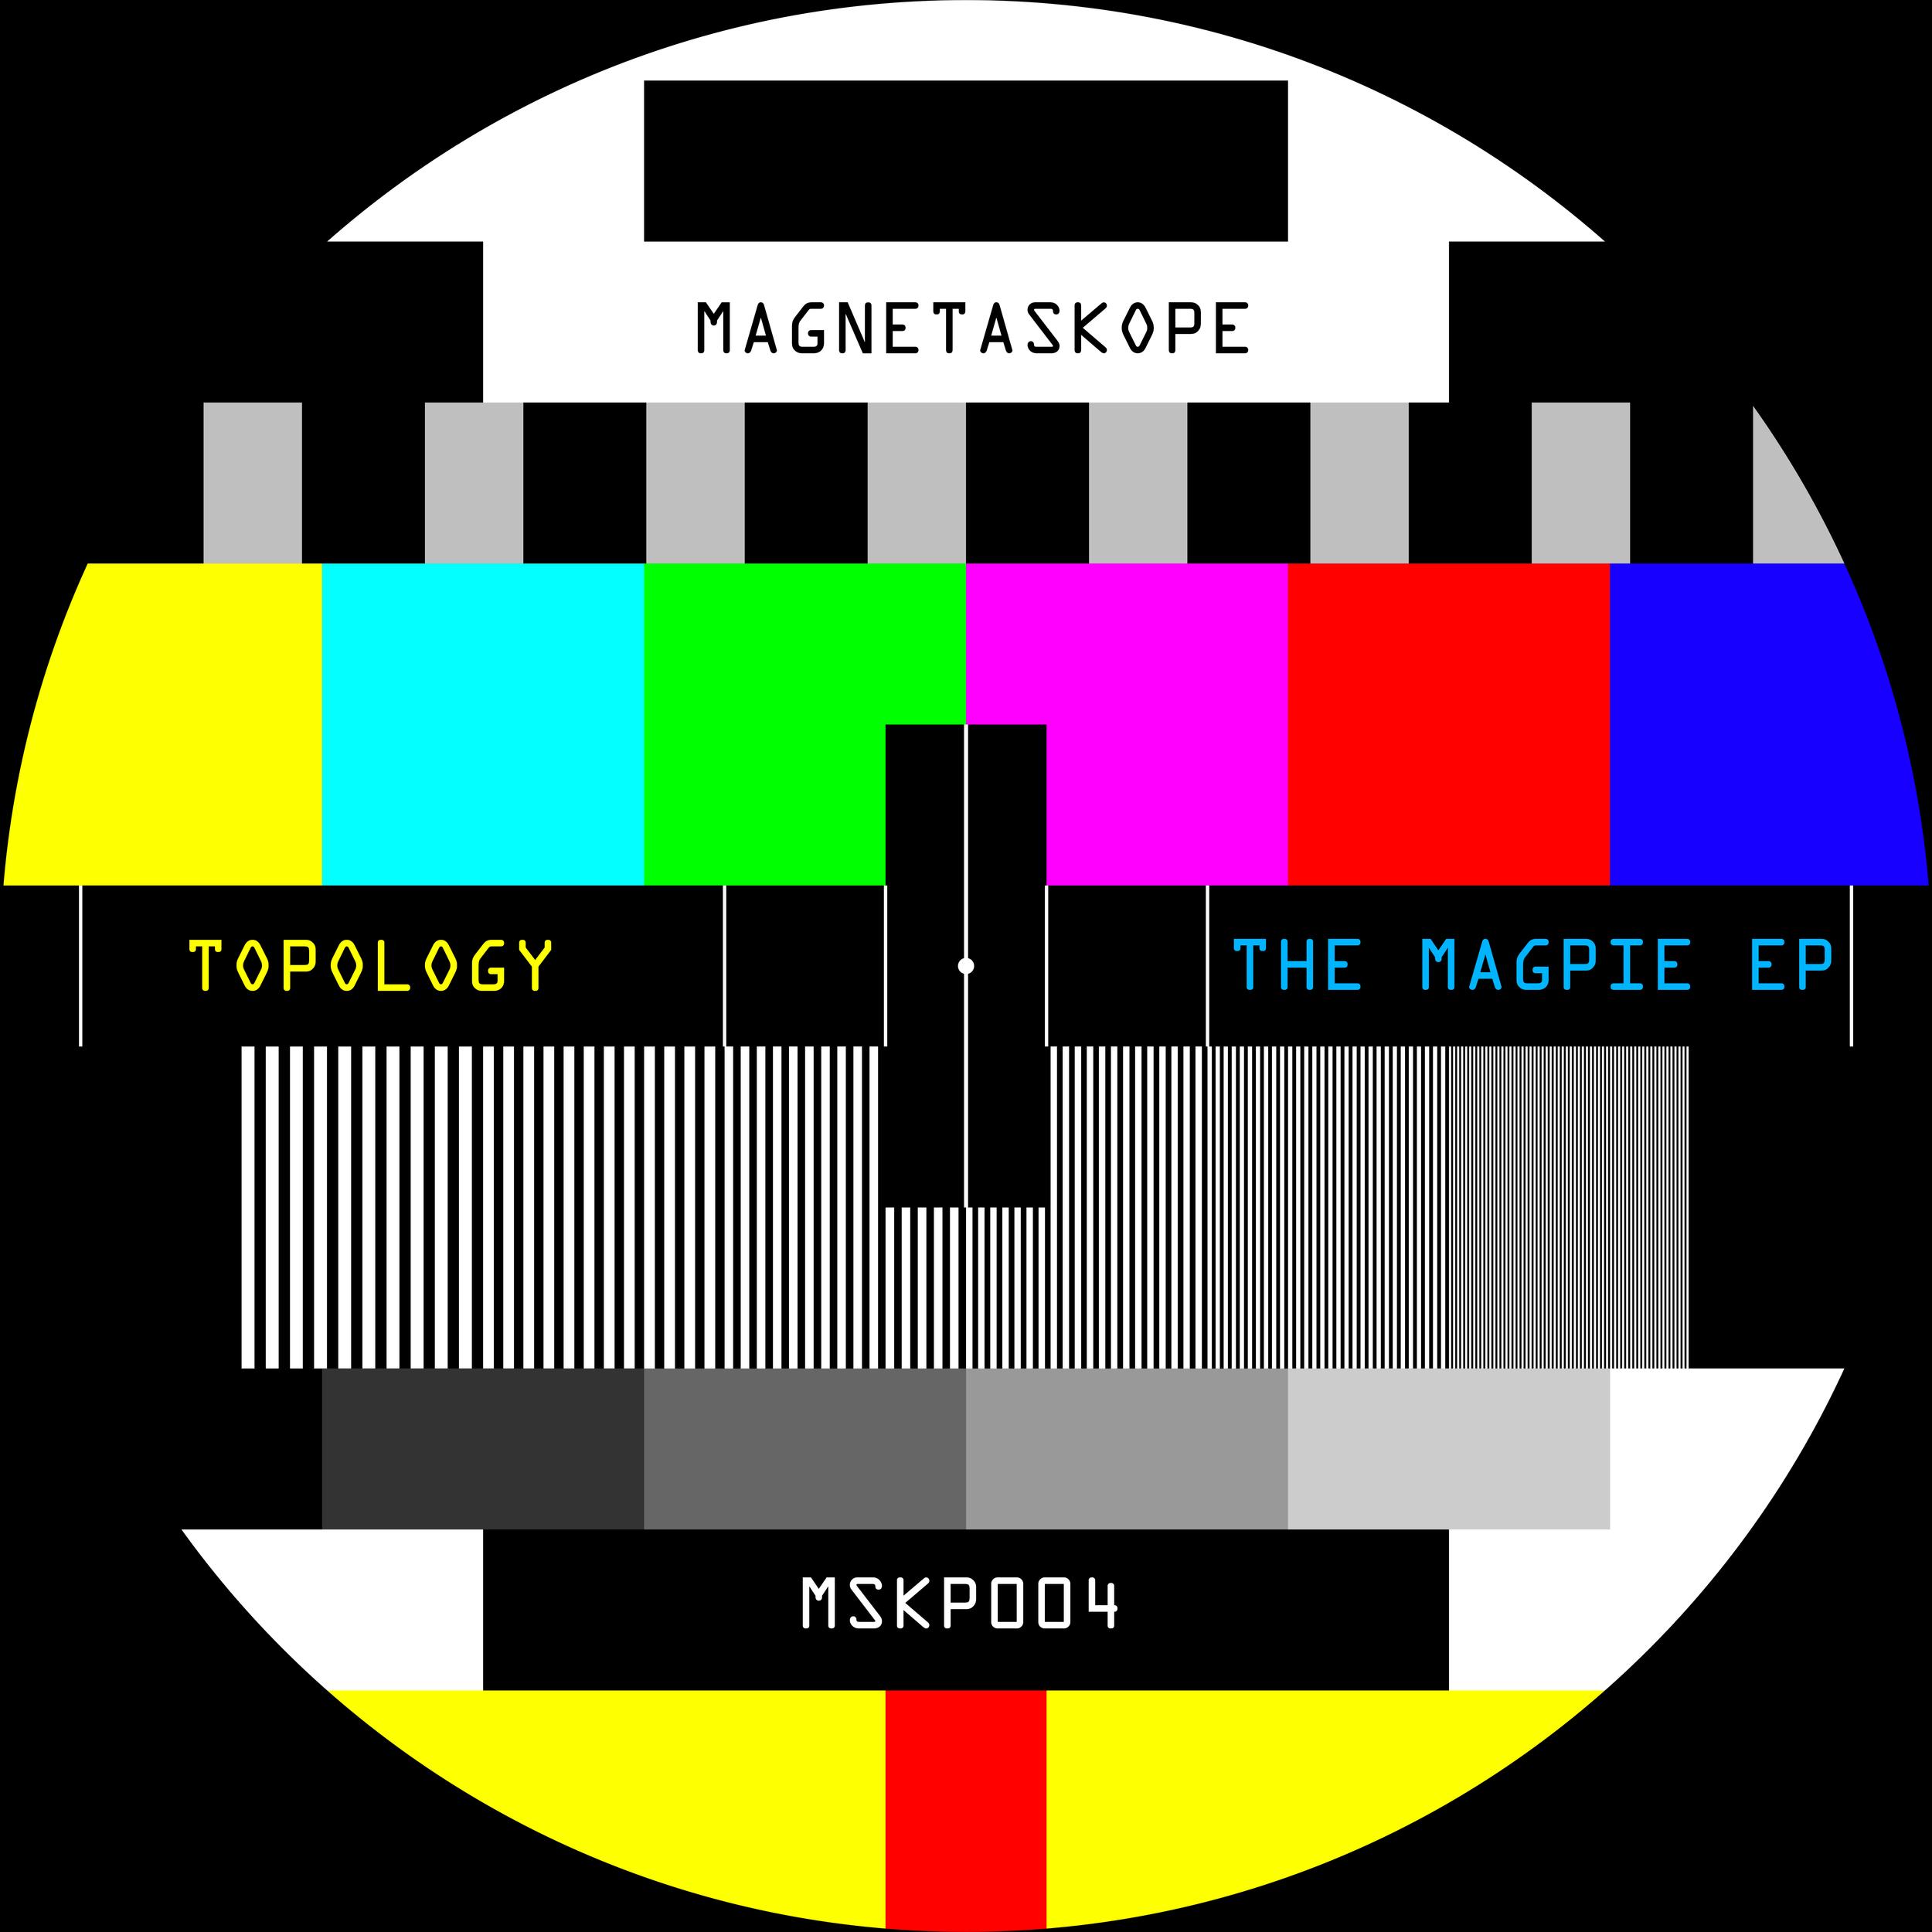 MSKP004 - TOPOLOGY // THE MAGPIE EPRELEASED 11.01.2018